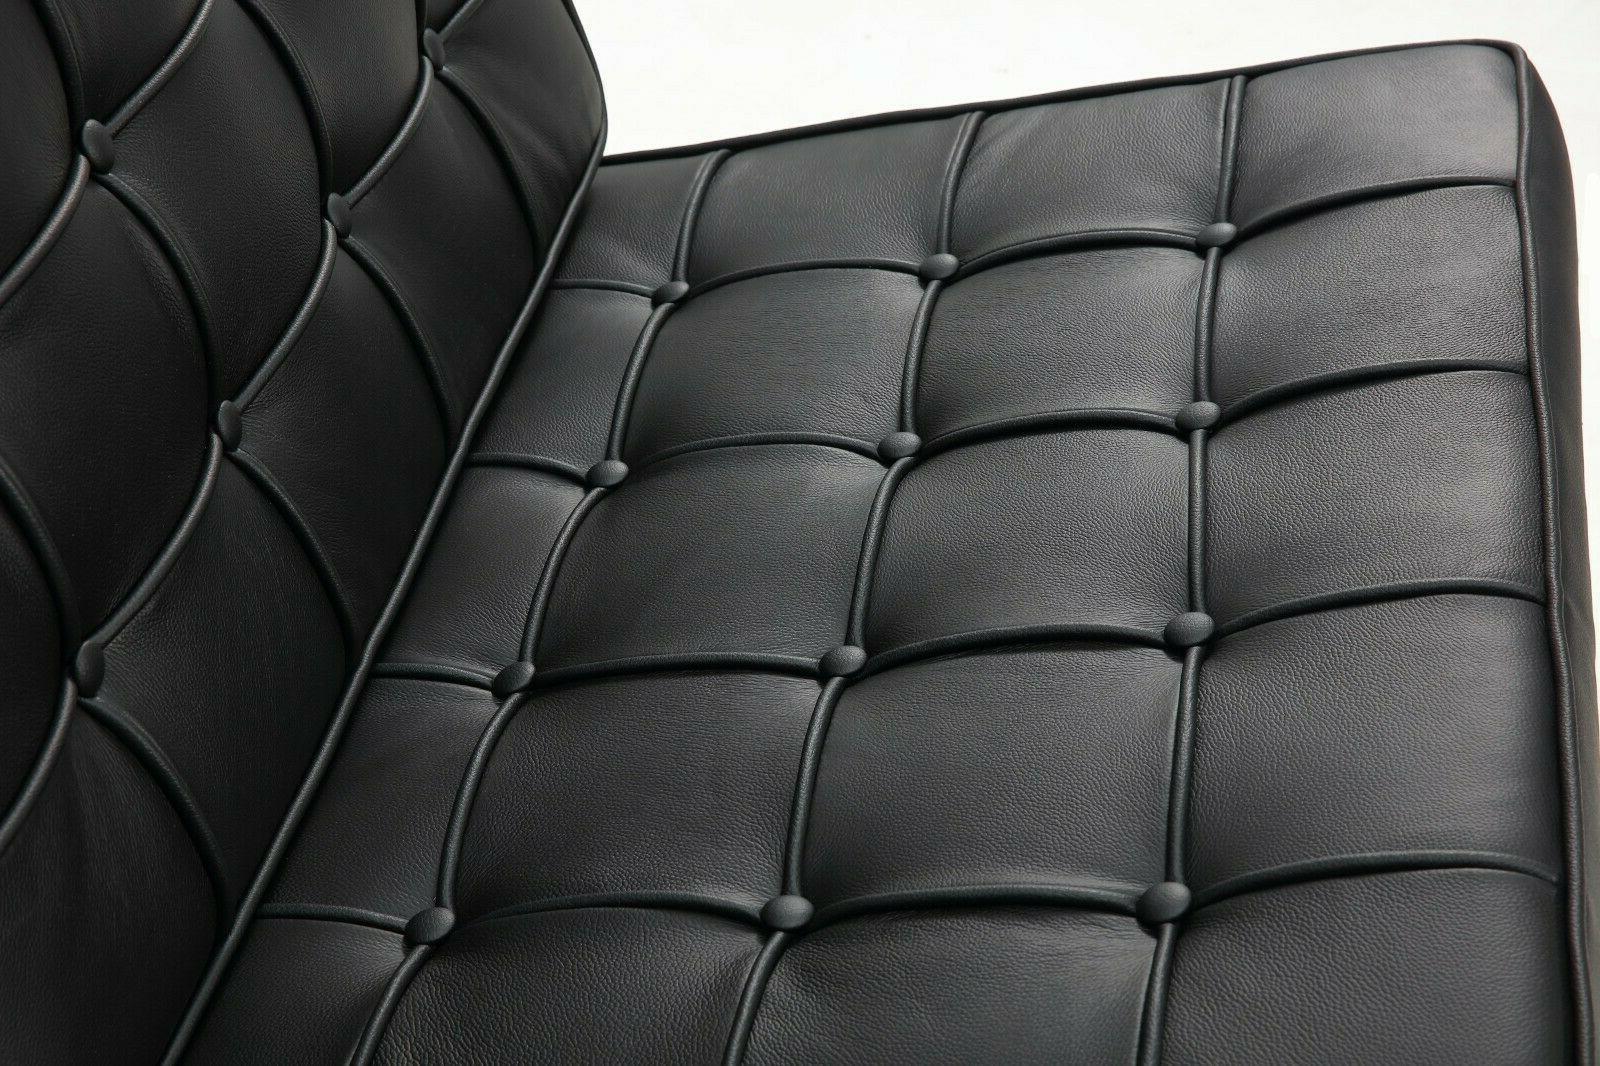 Atayal Leather Barcelona Chair, Single Chair, Ergonomic